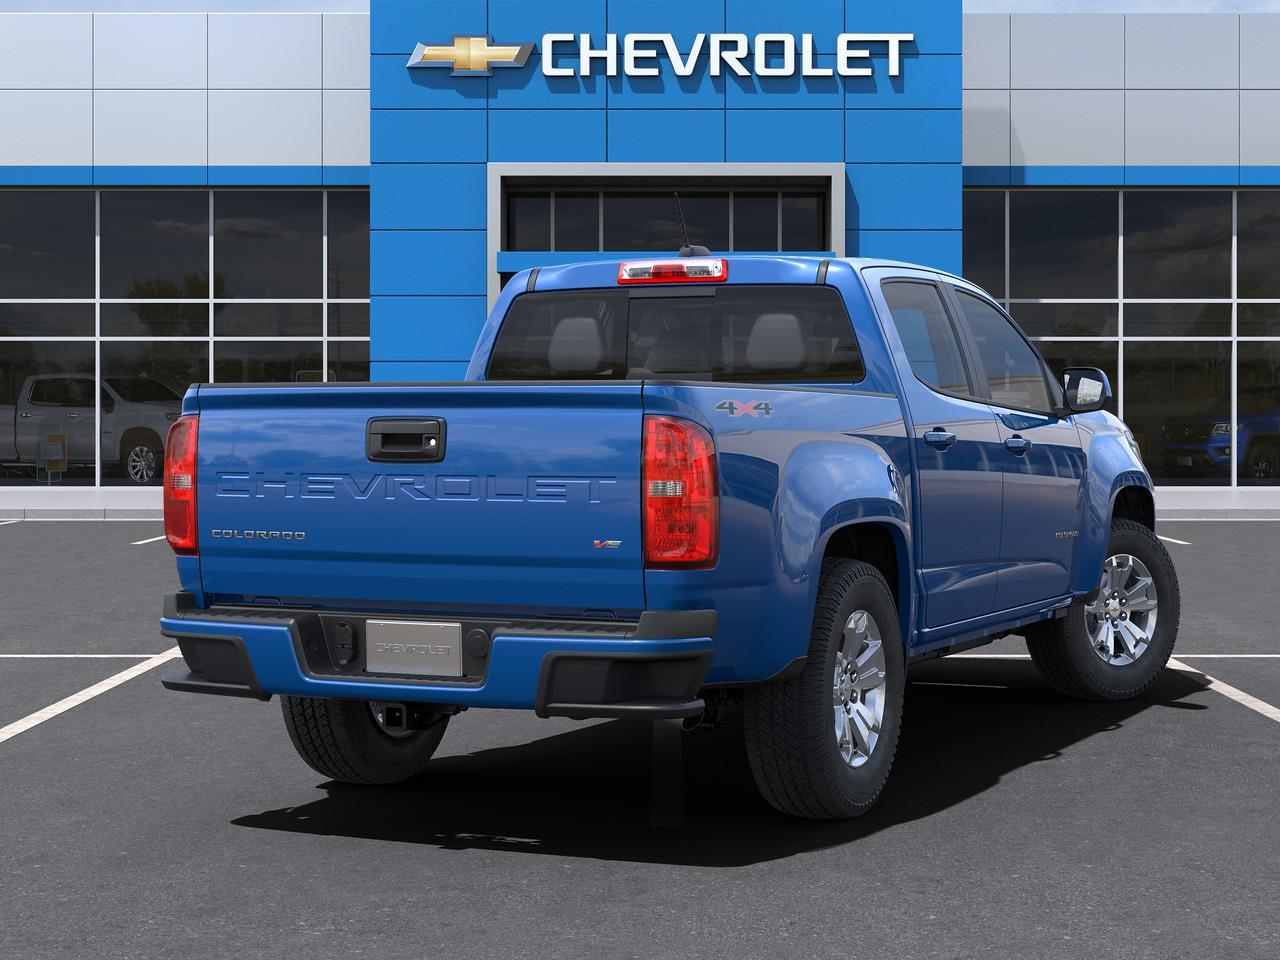 2021 Chevrolet Colorado Crew Cab 4x4, Pickup #Q210428 - photo 2